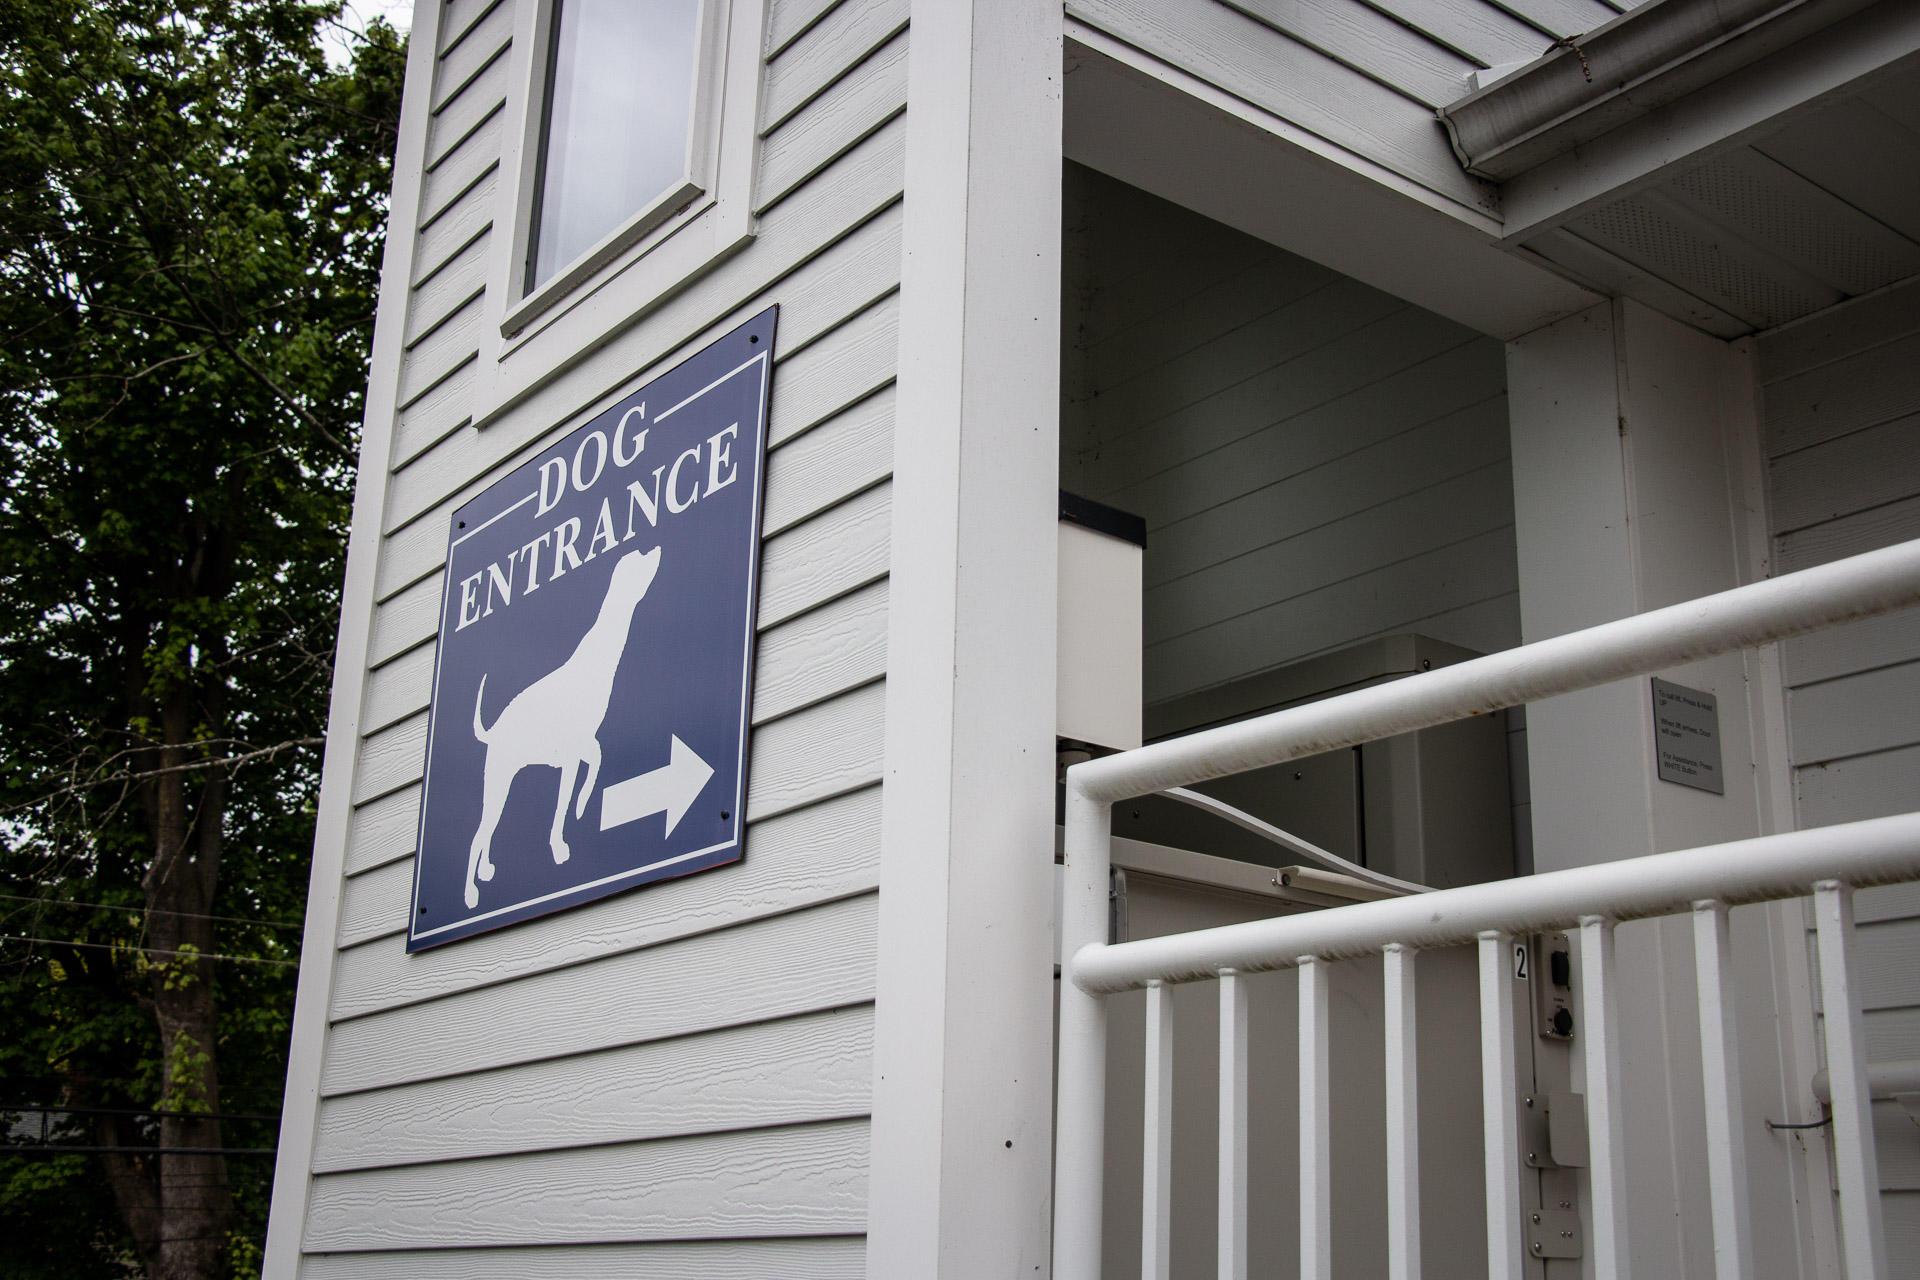 Family Pet Clinic 2 image 3